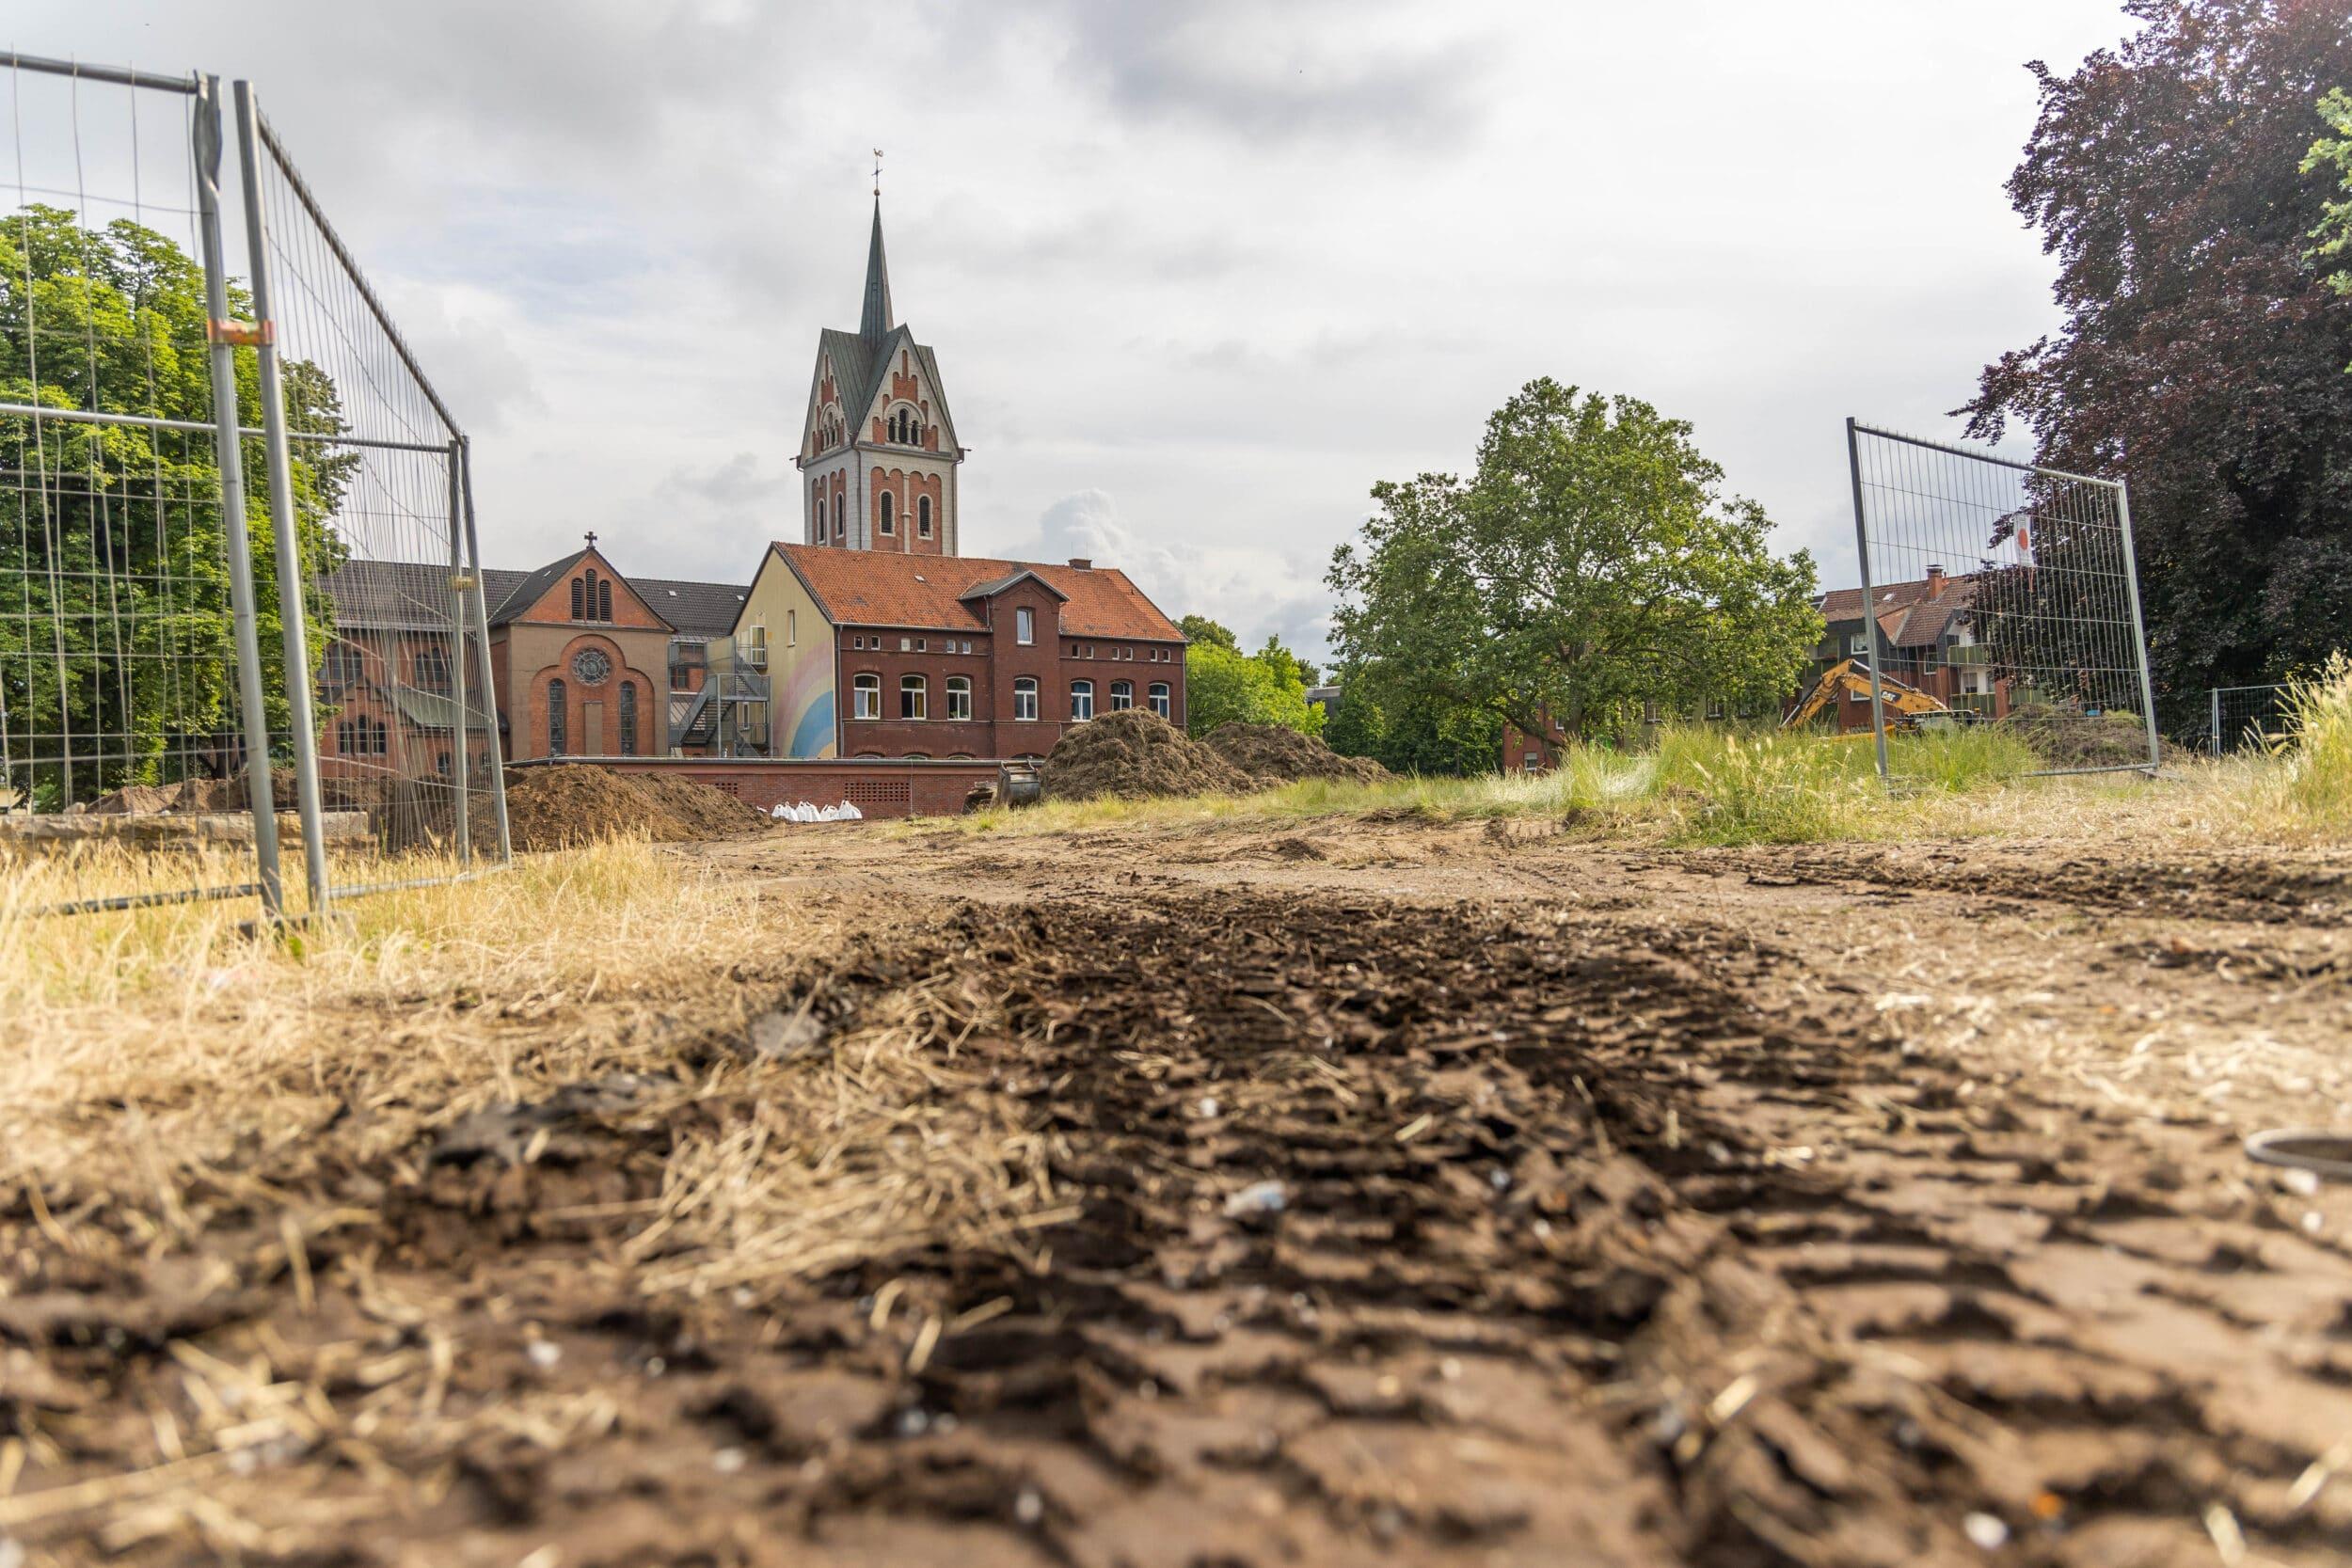 Mitten in Dorstfeld: Erst baggern, dann Antrag stellen?